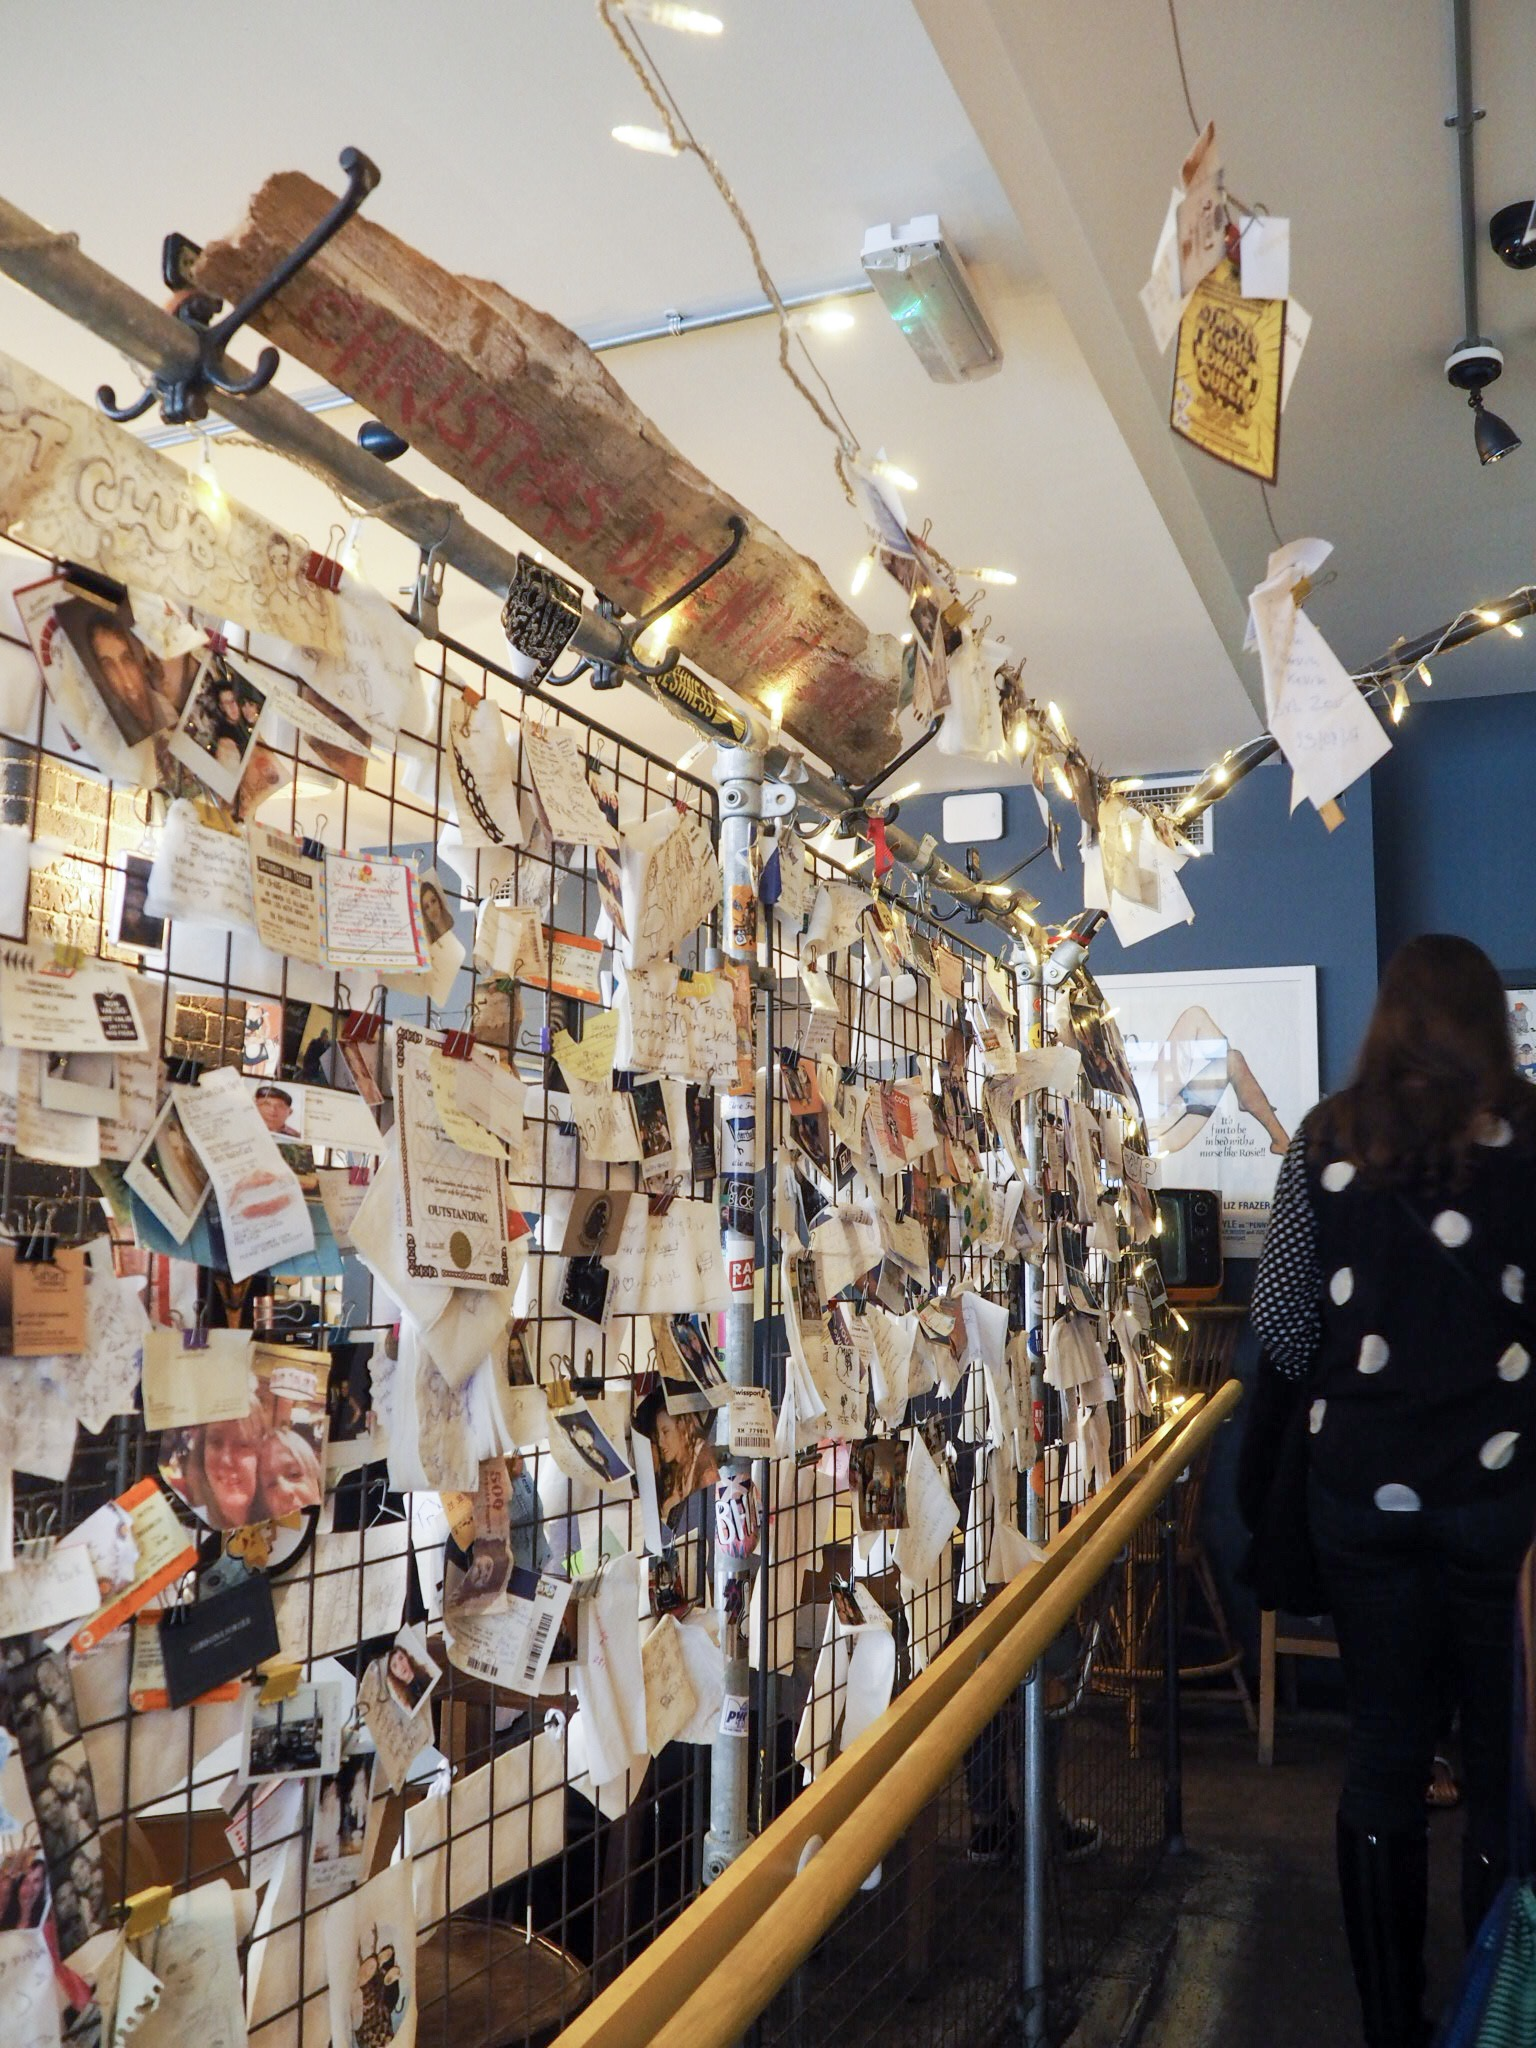 The Breakfast Club memory wall